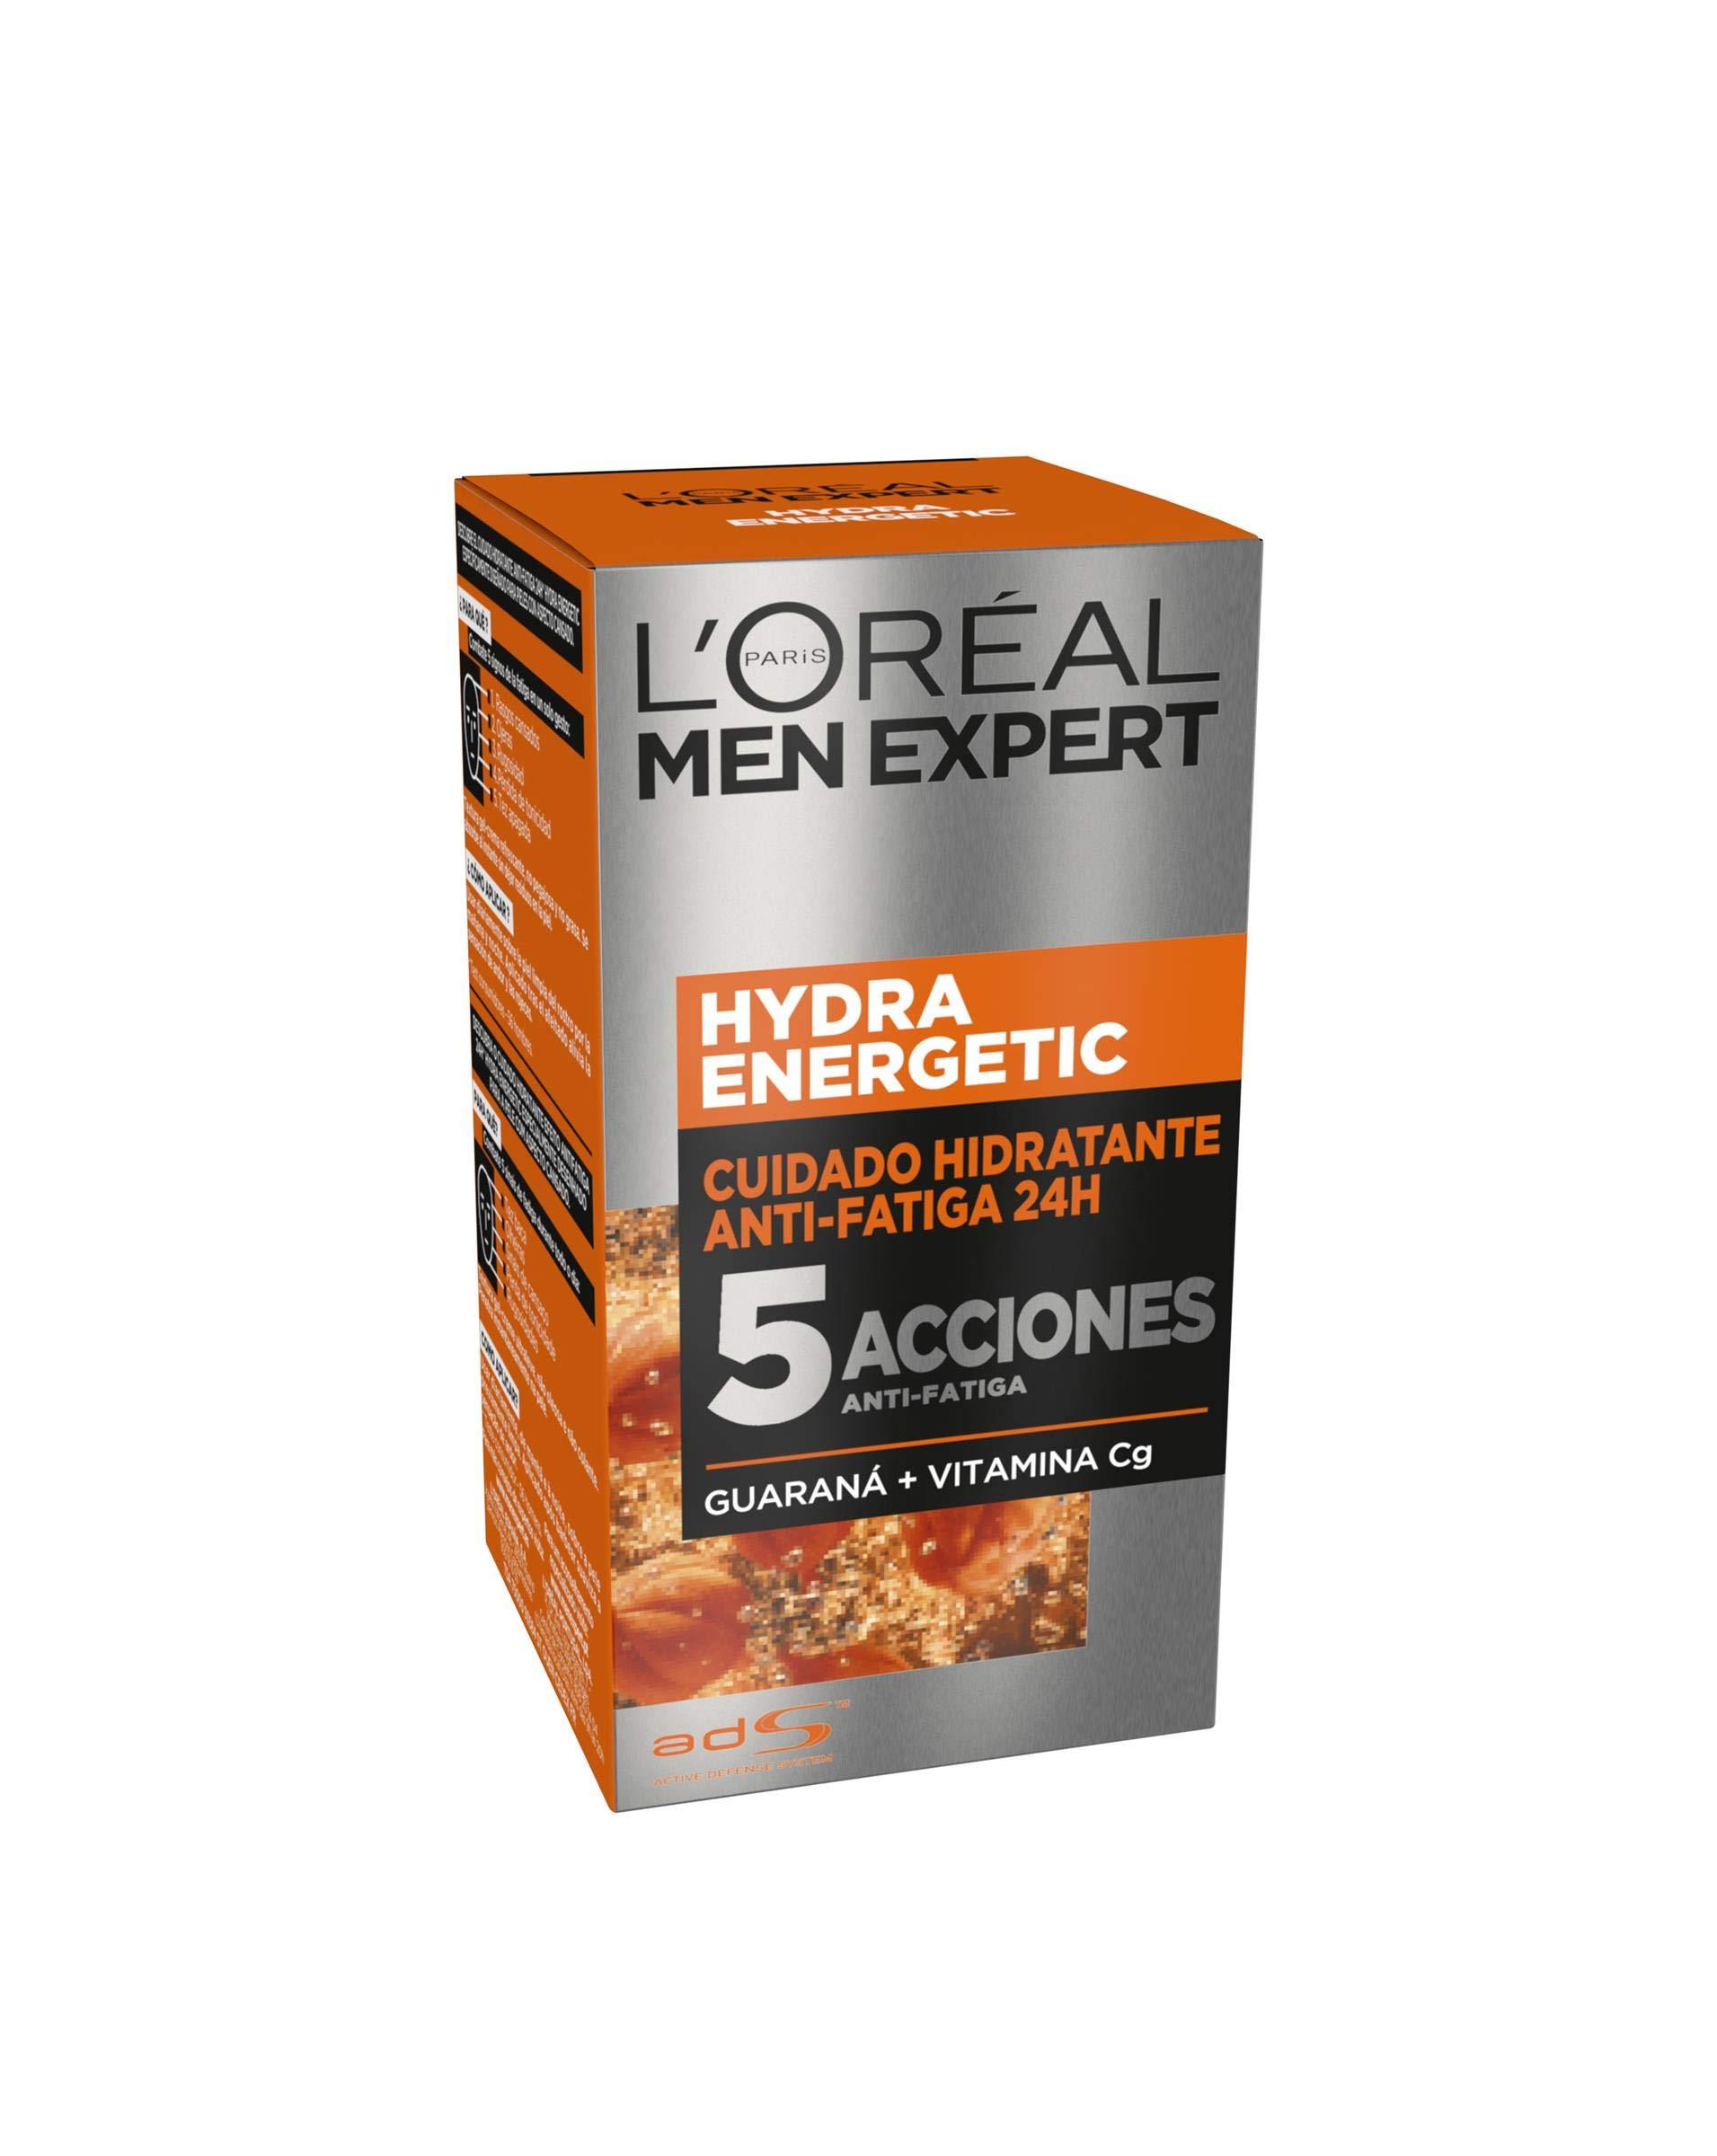 L'Oréal Paris Men Expert Hydra Energetic Crema Hidratante Anti-Fatiga para hombre - 50 ml product image